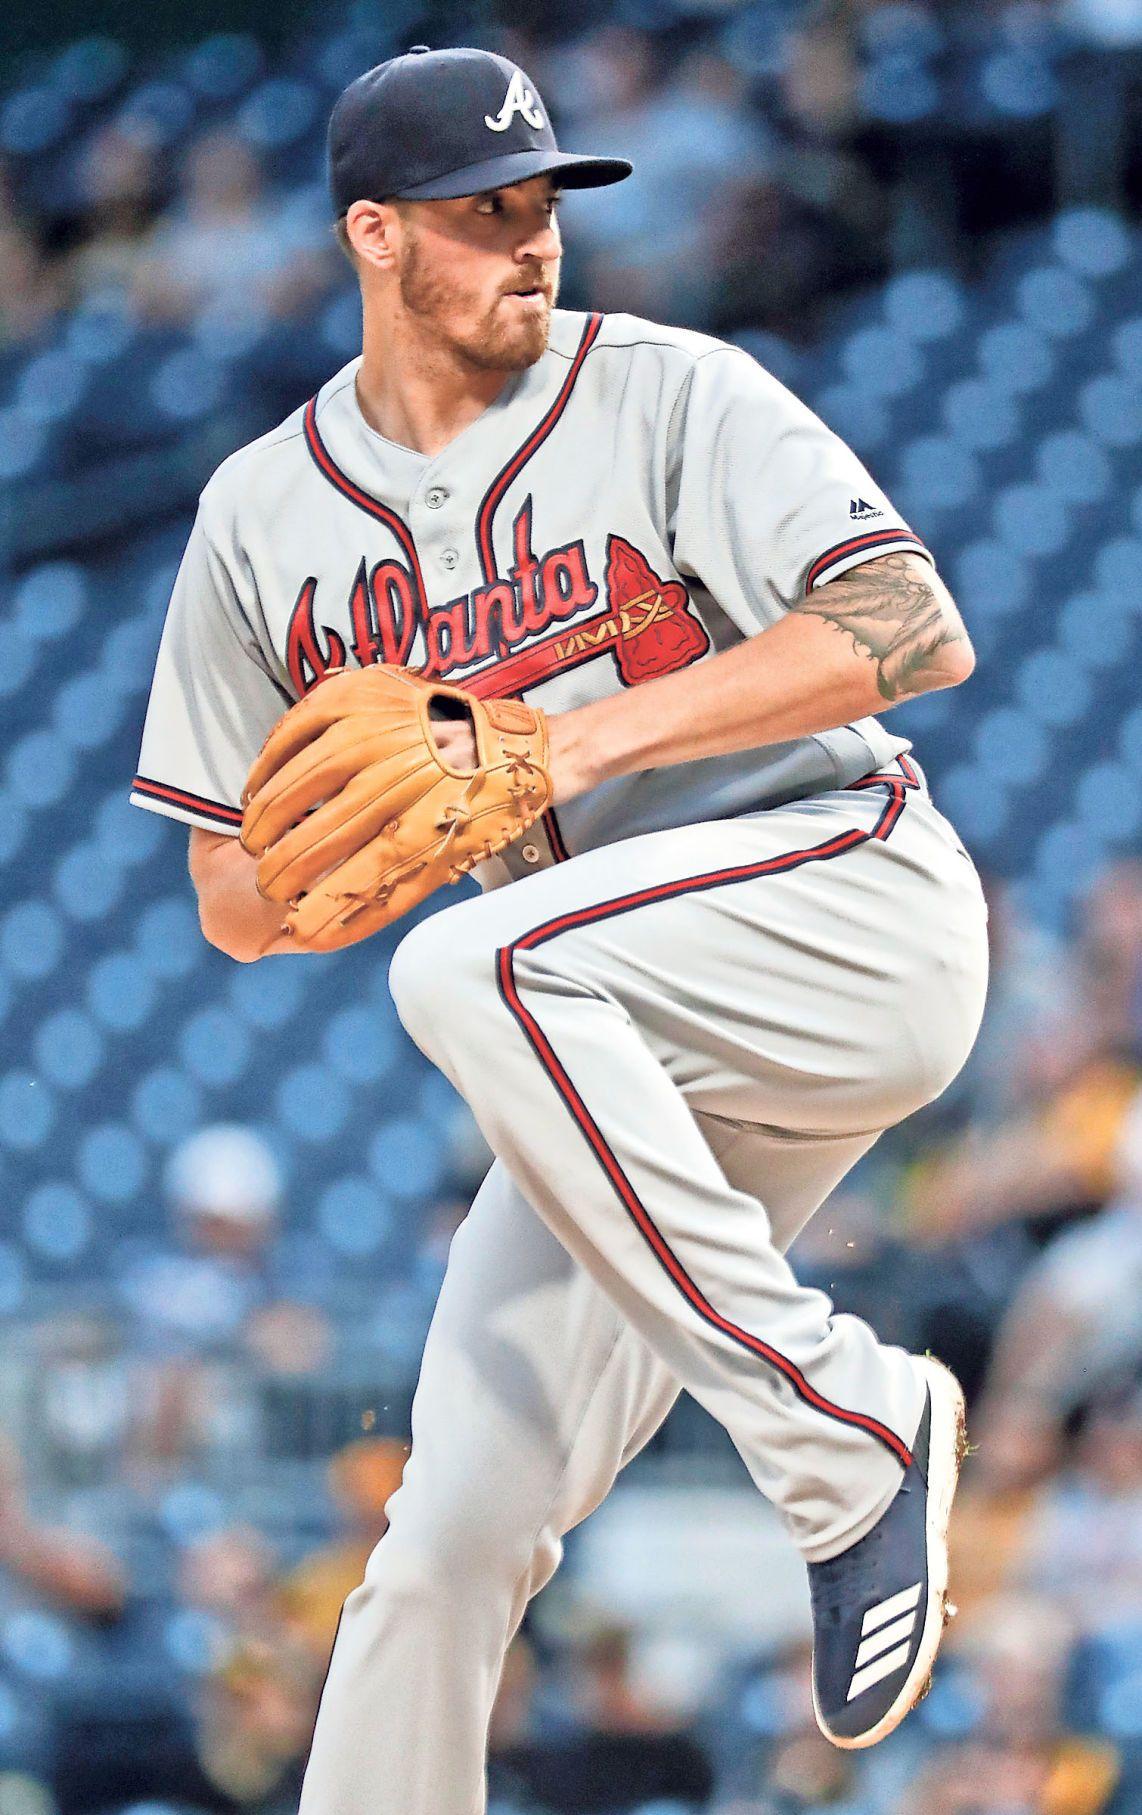 Atlanta Braves starter Kevin Gausman pitches against the